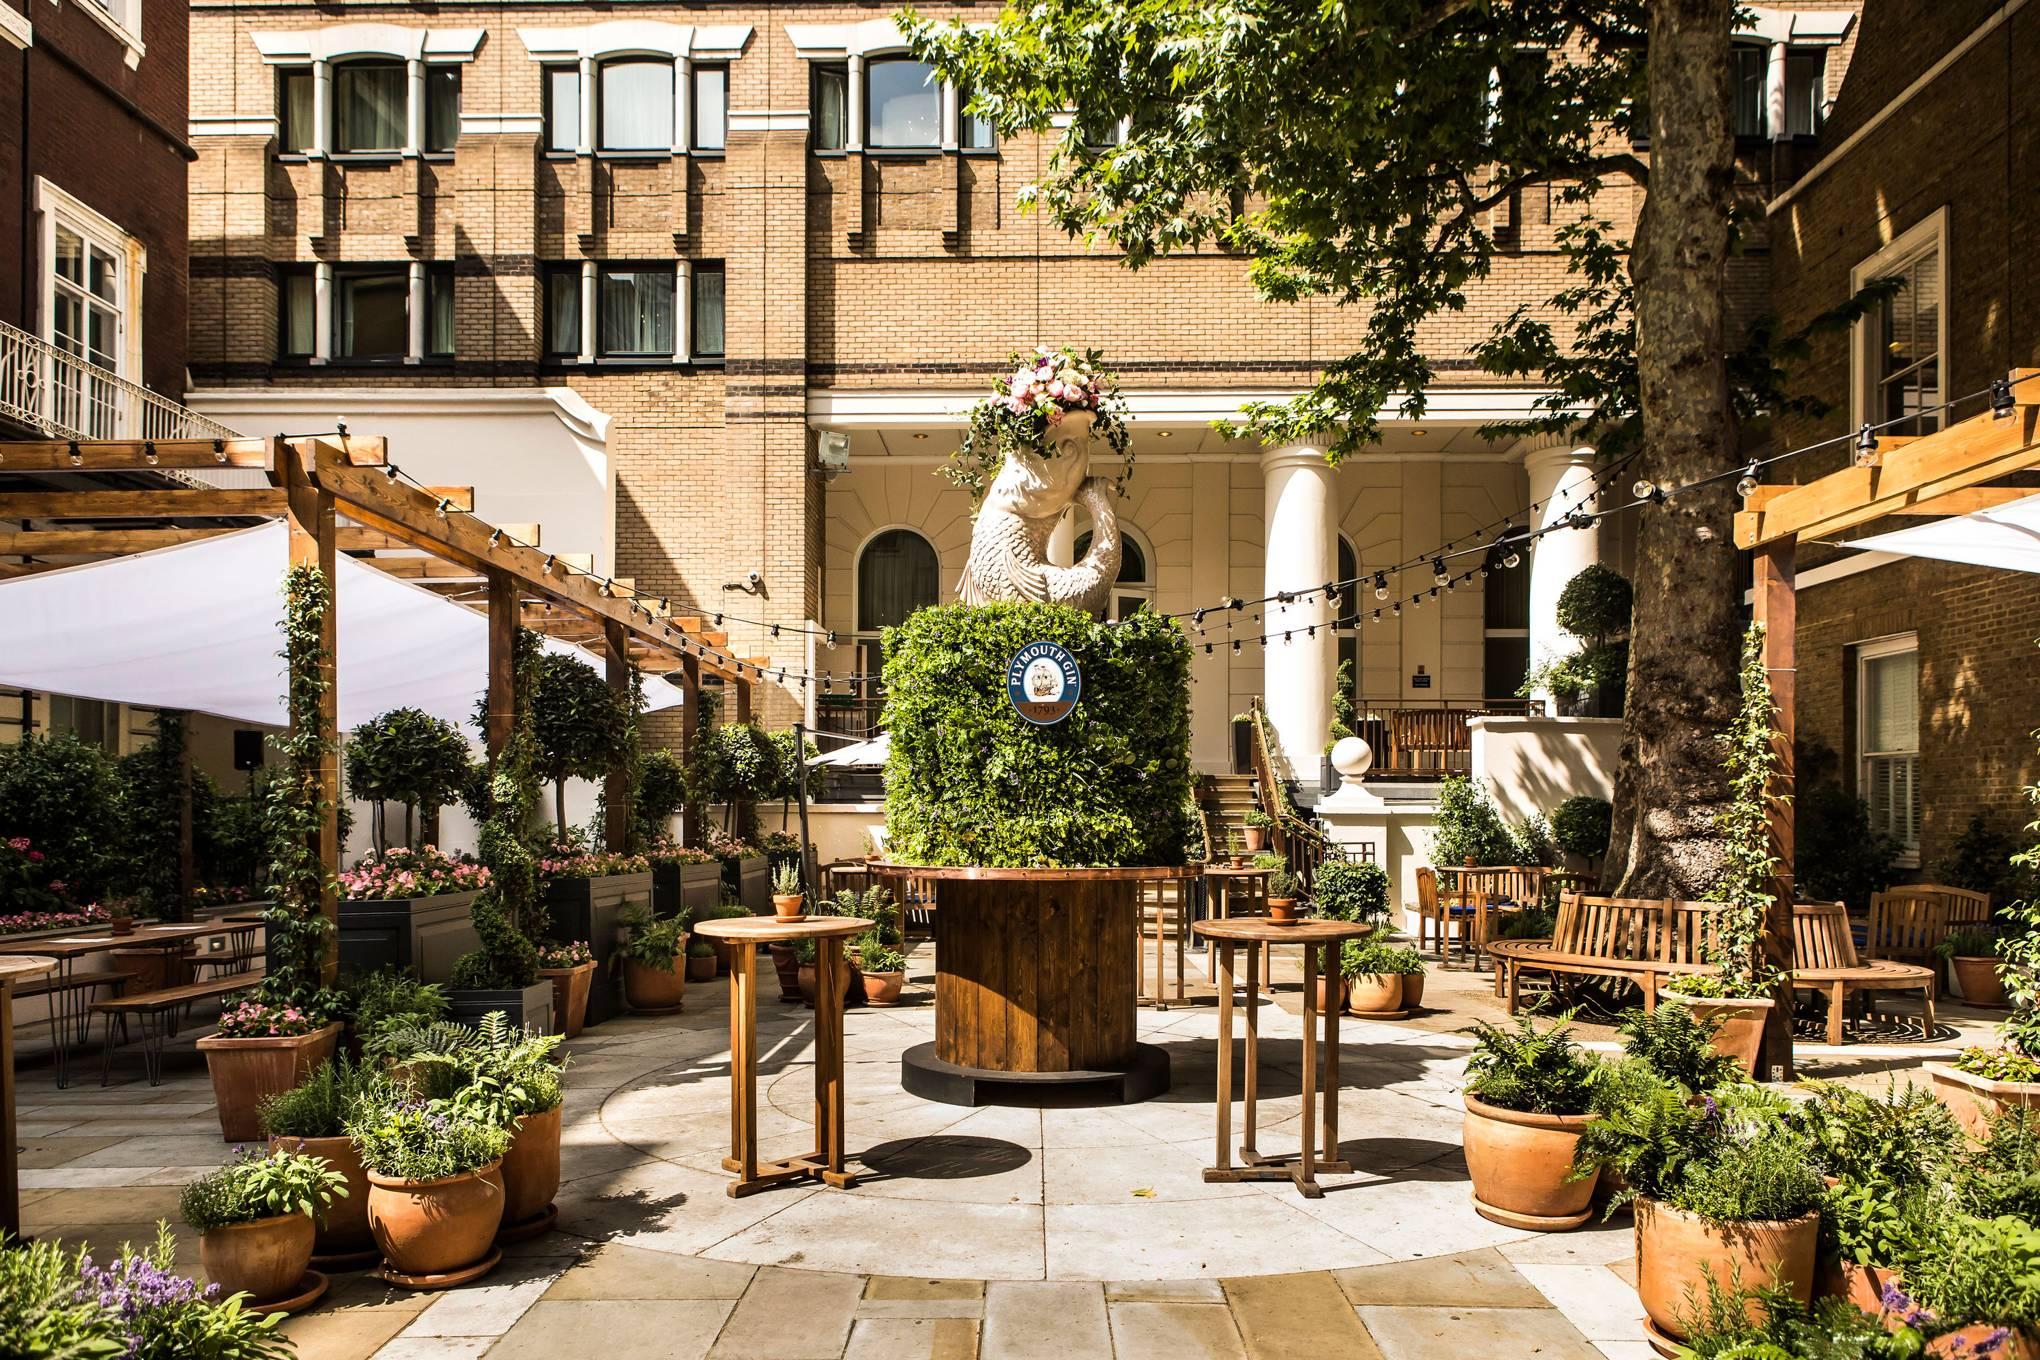 London restaurants with gardens | CN Traveller